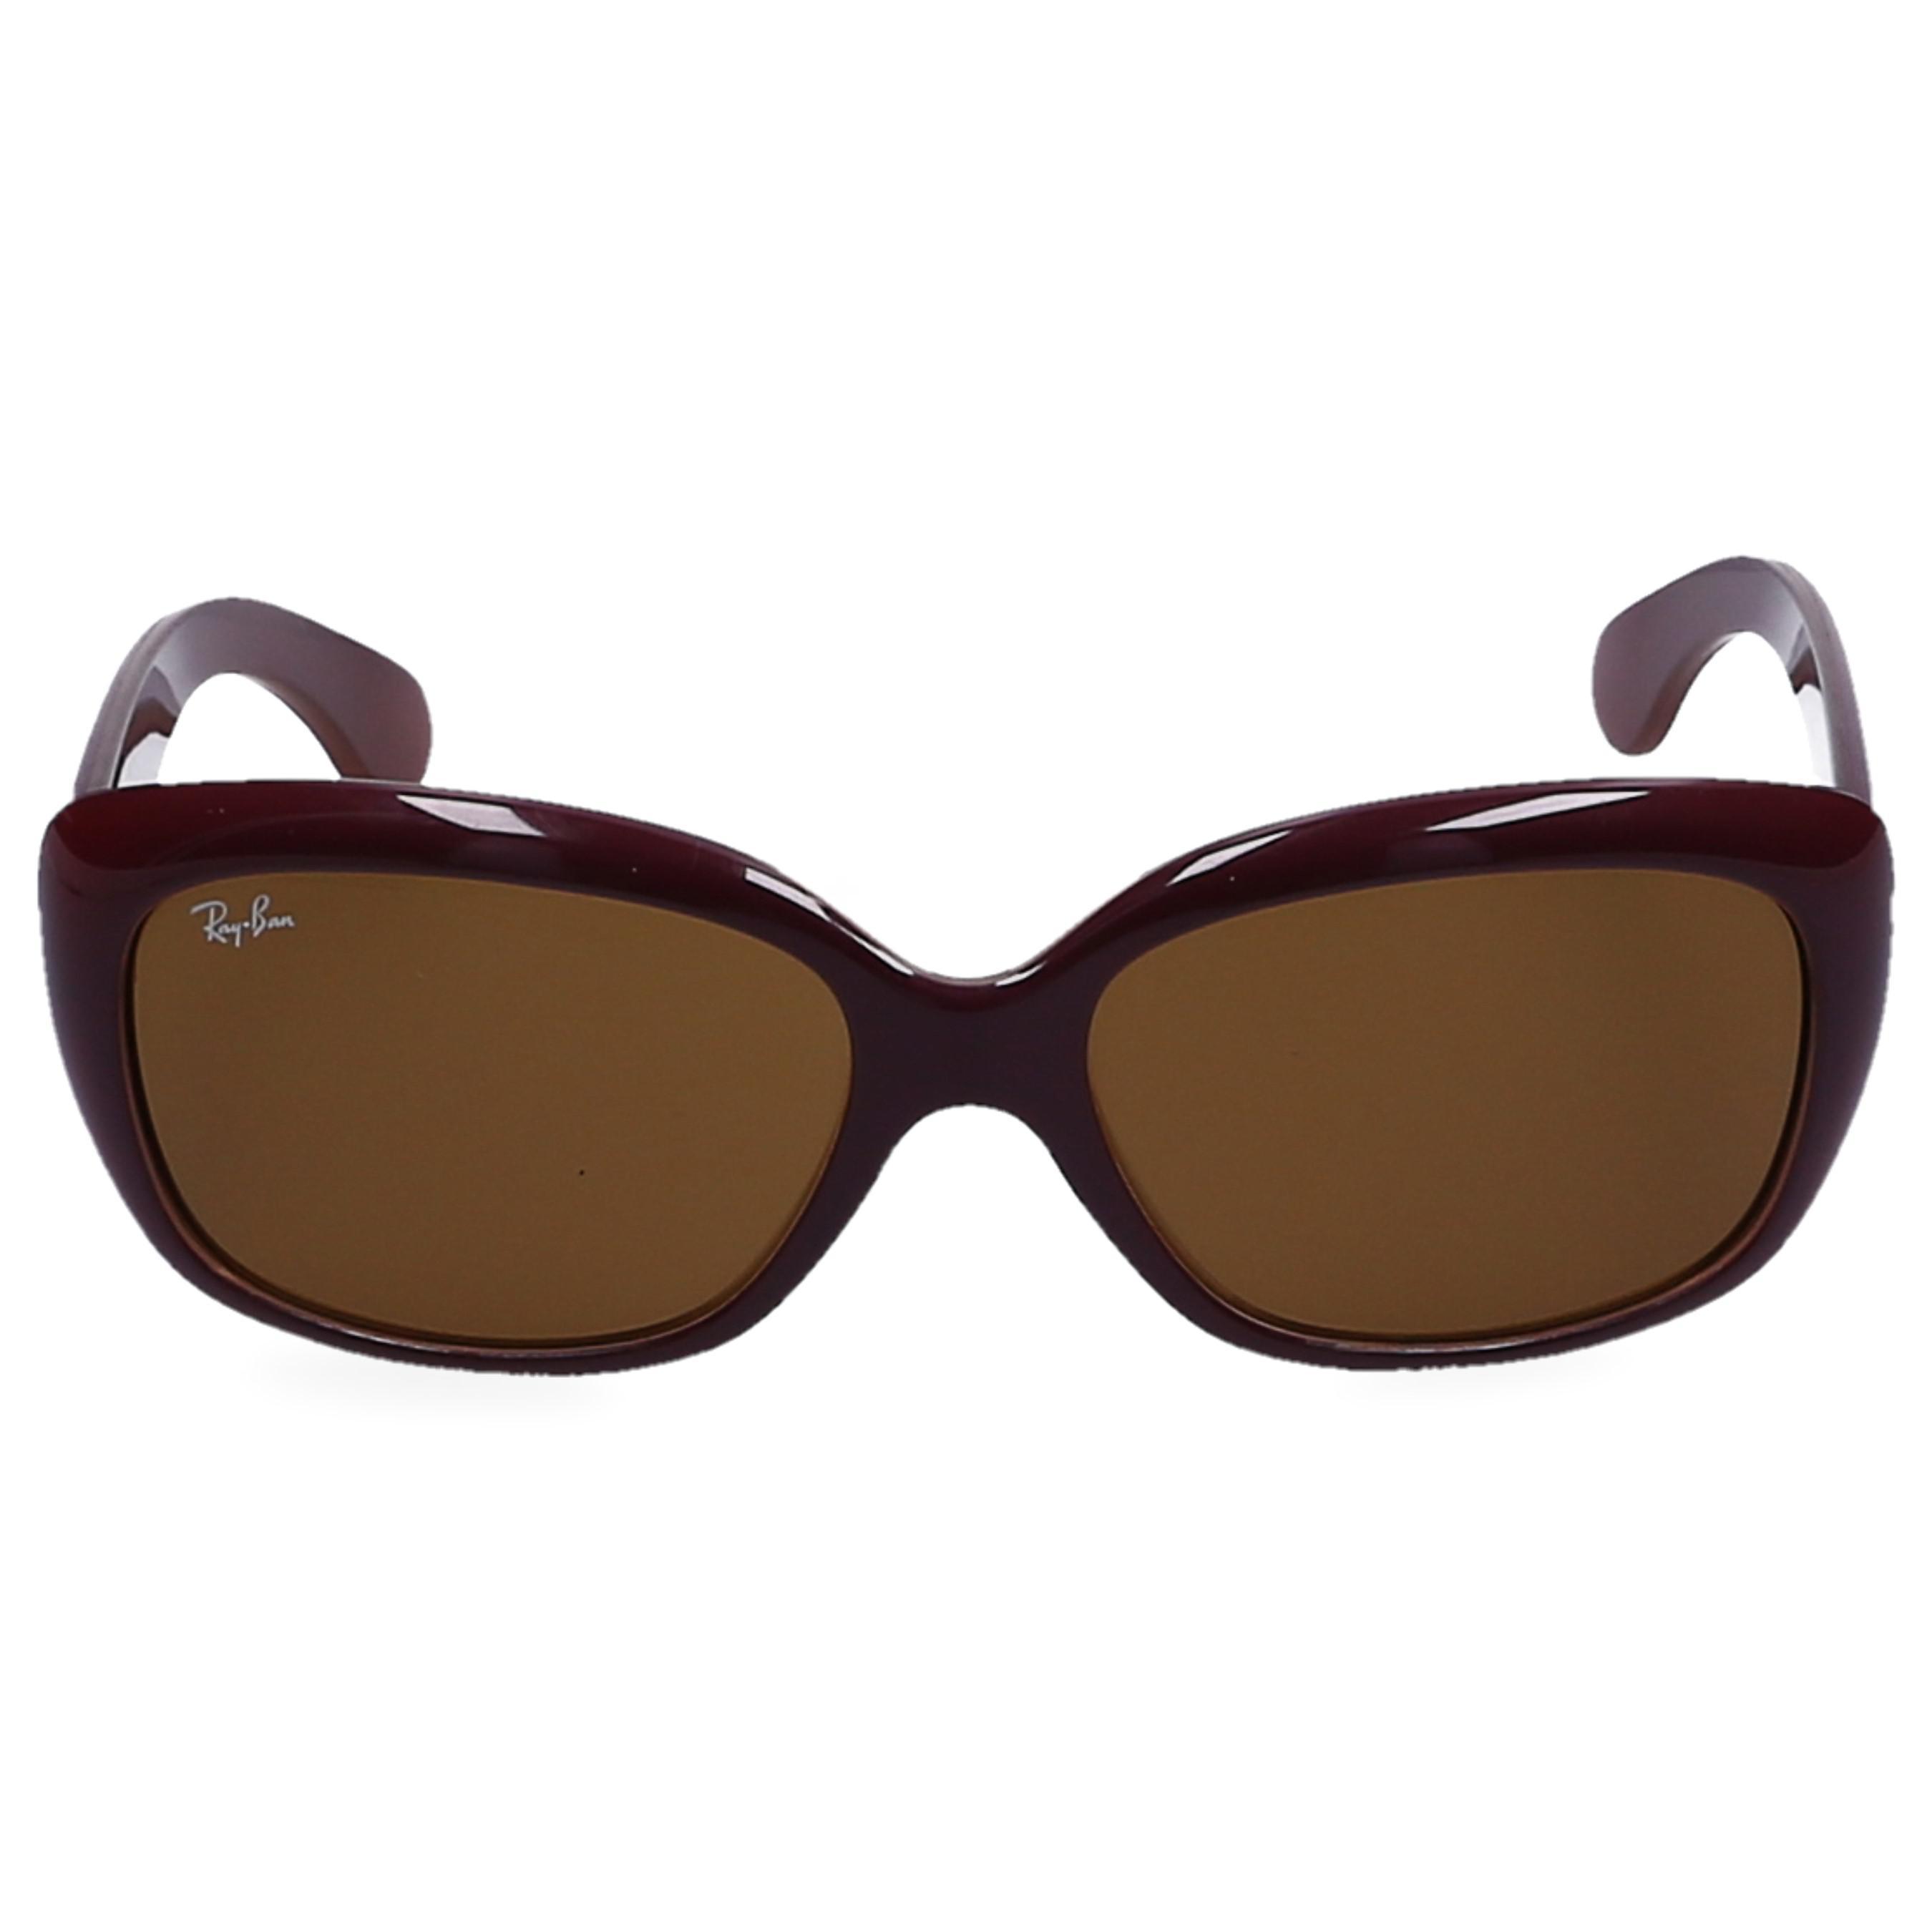 c4a7fd18f5d Lyst - Ray-Ban Women Sunglasses Rectangular 4101 Nylon Bordeaux in Brown